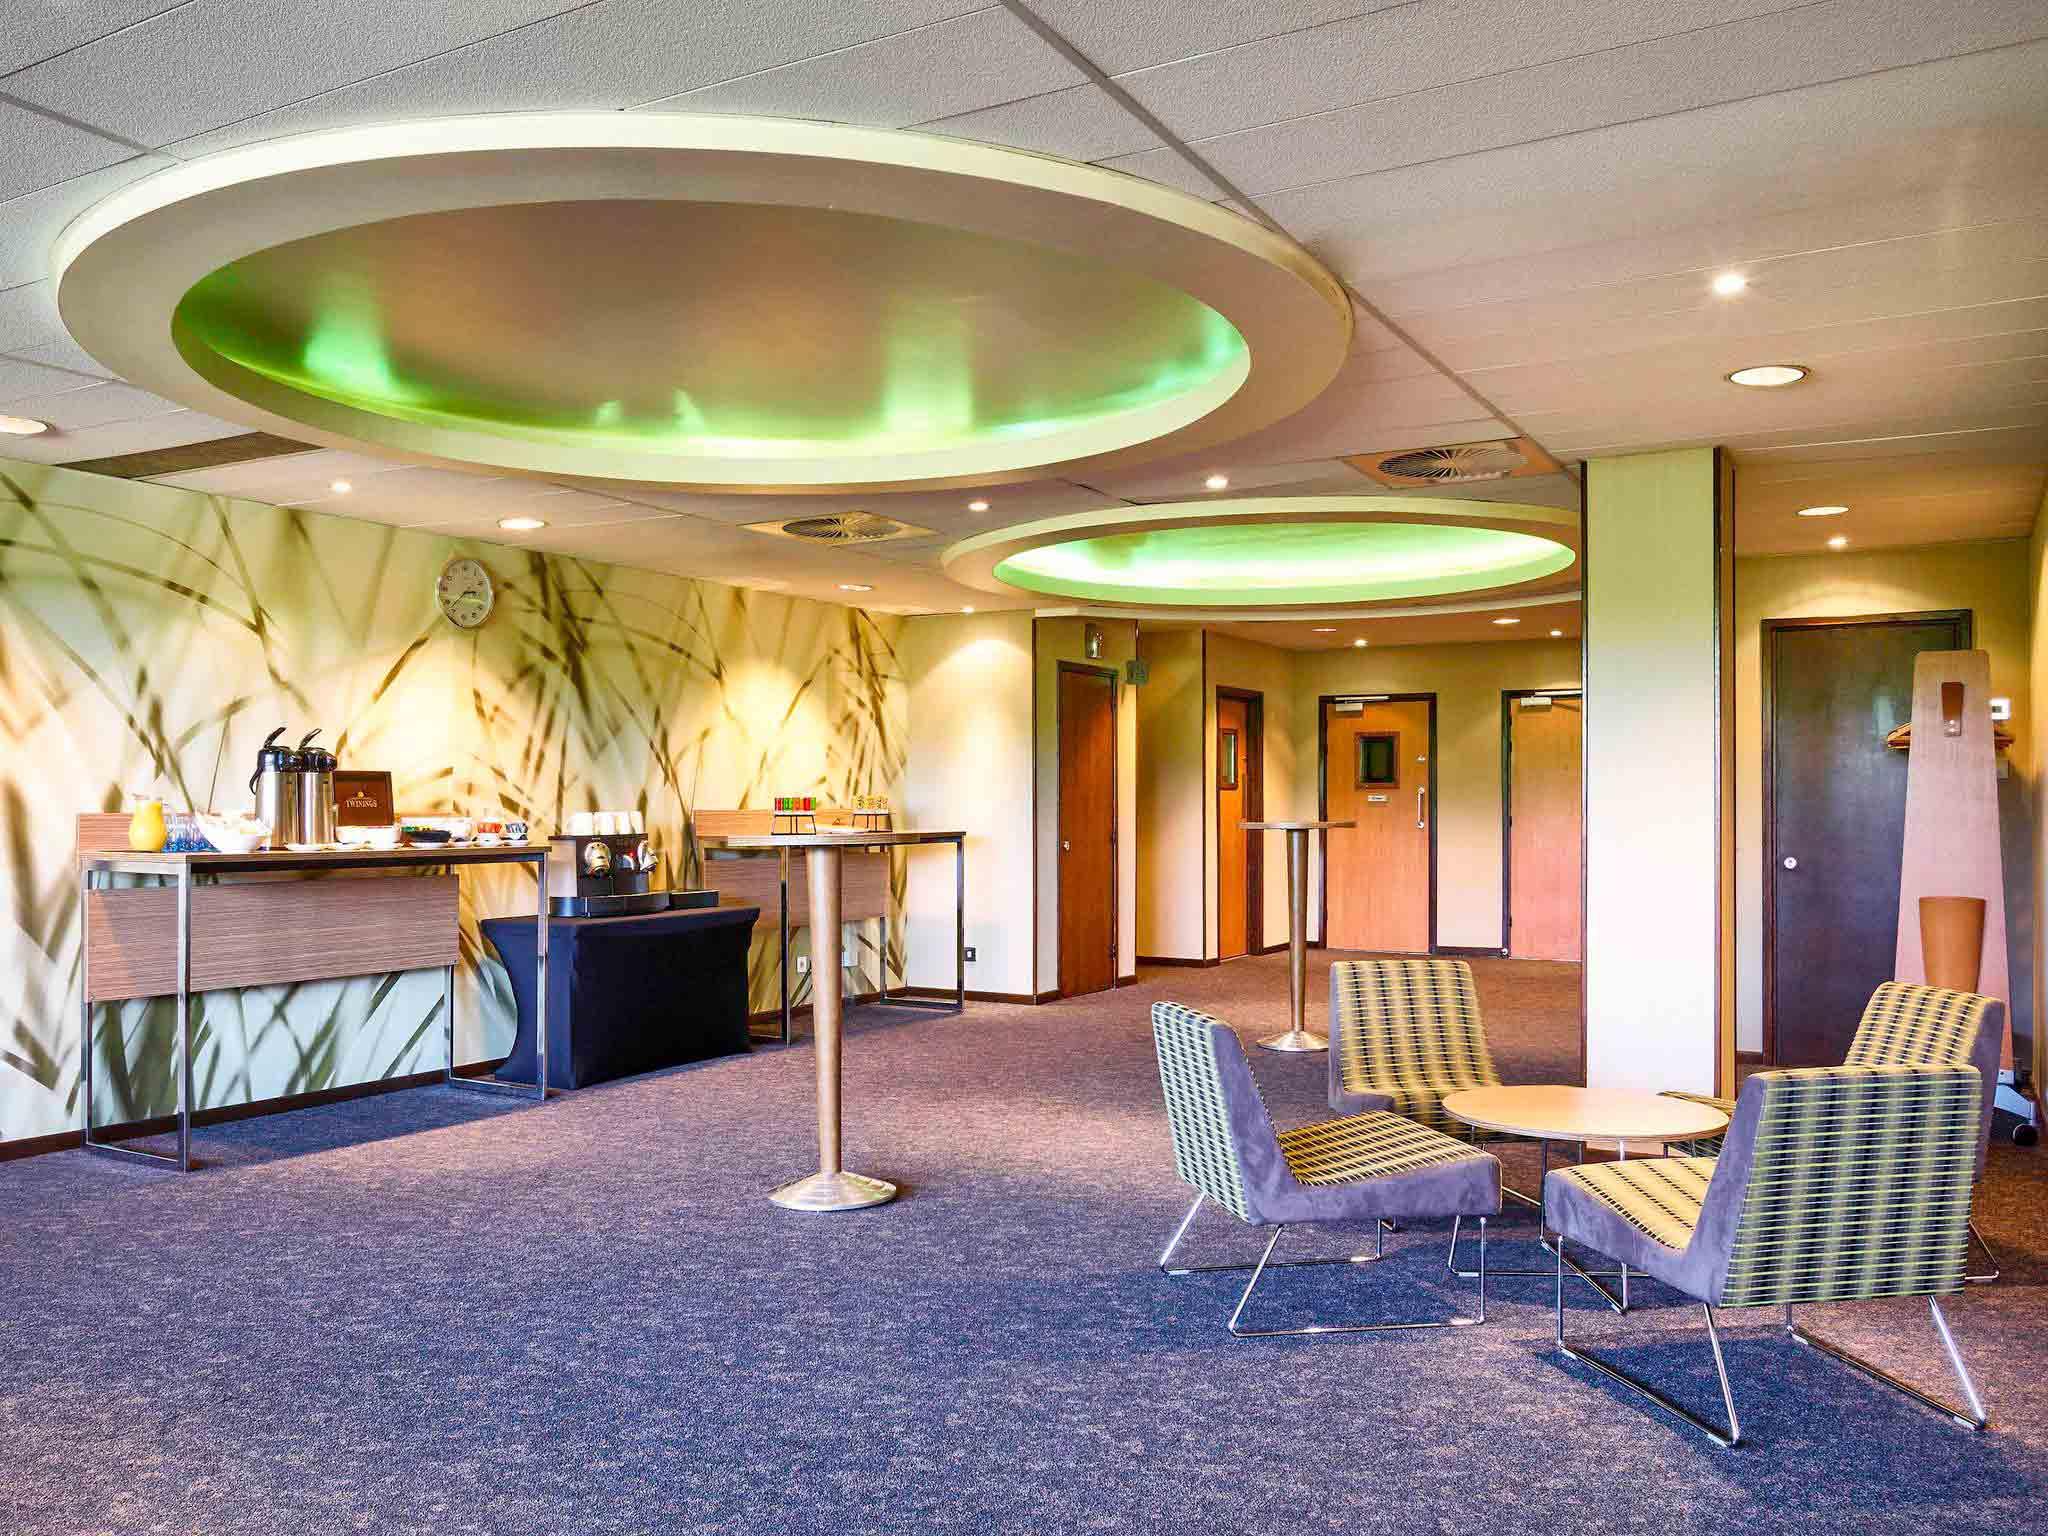 Novotel Milton Keynes Spacoius Hotel In Milton Keynes